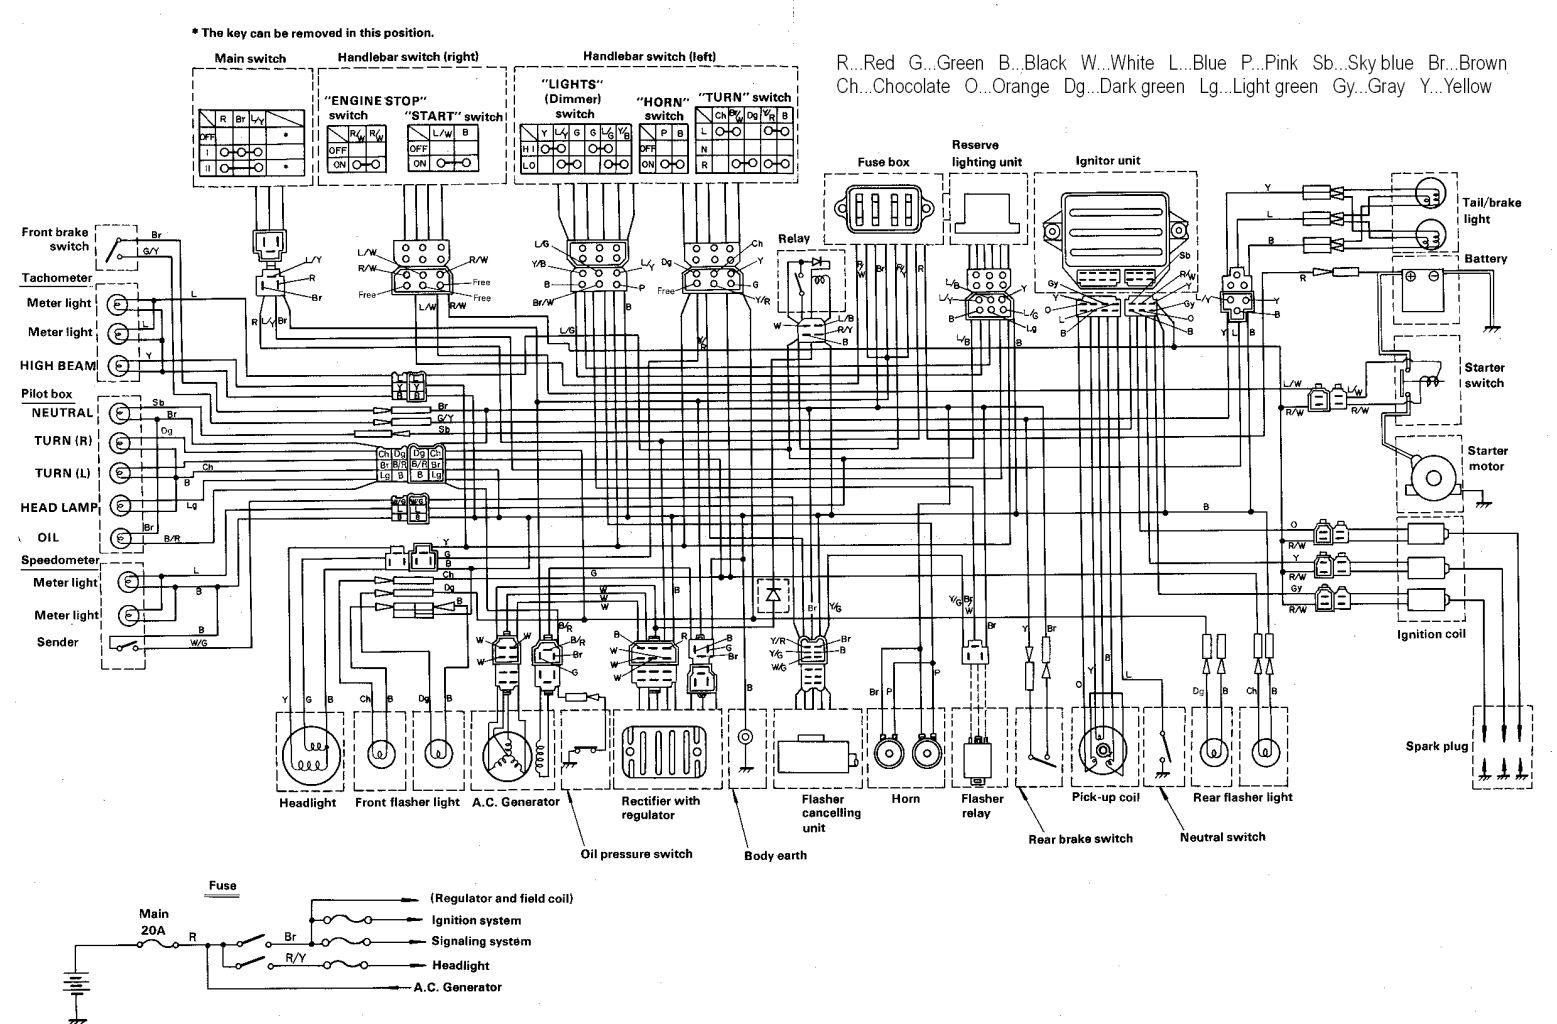 Swell Wrg 9867 83 Yamaha Virago Wiring Diagram Wiring Cloud Lukepaidewilluminateatxorg